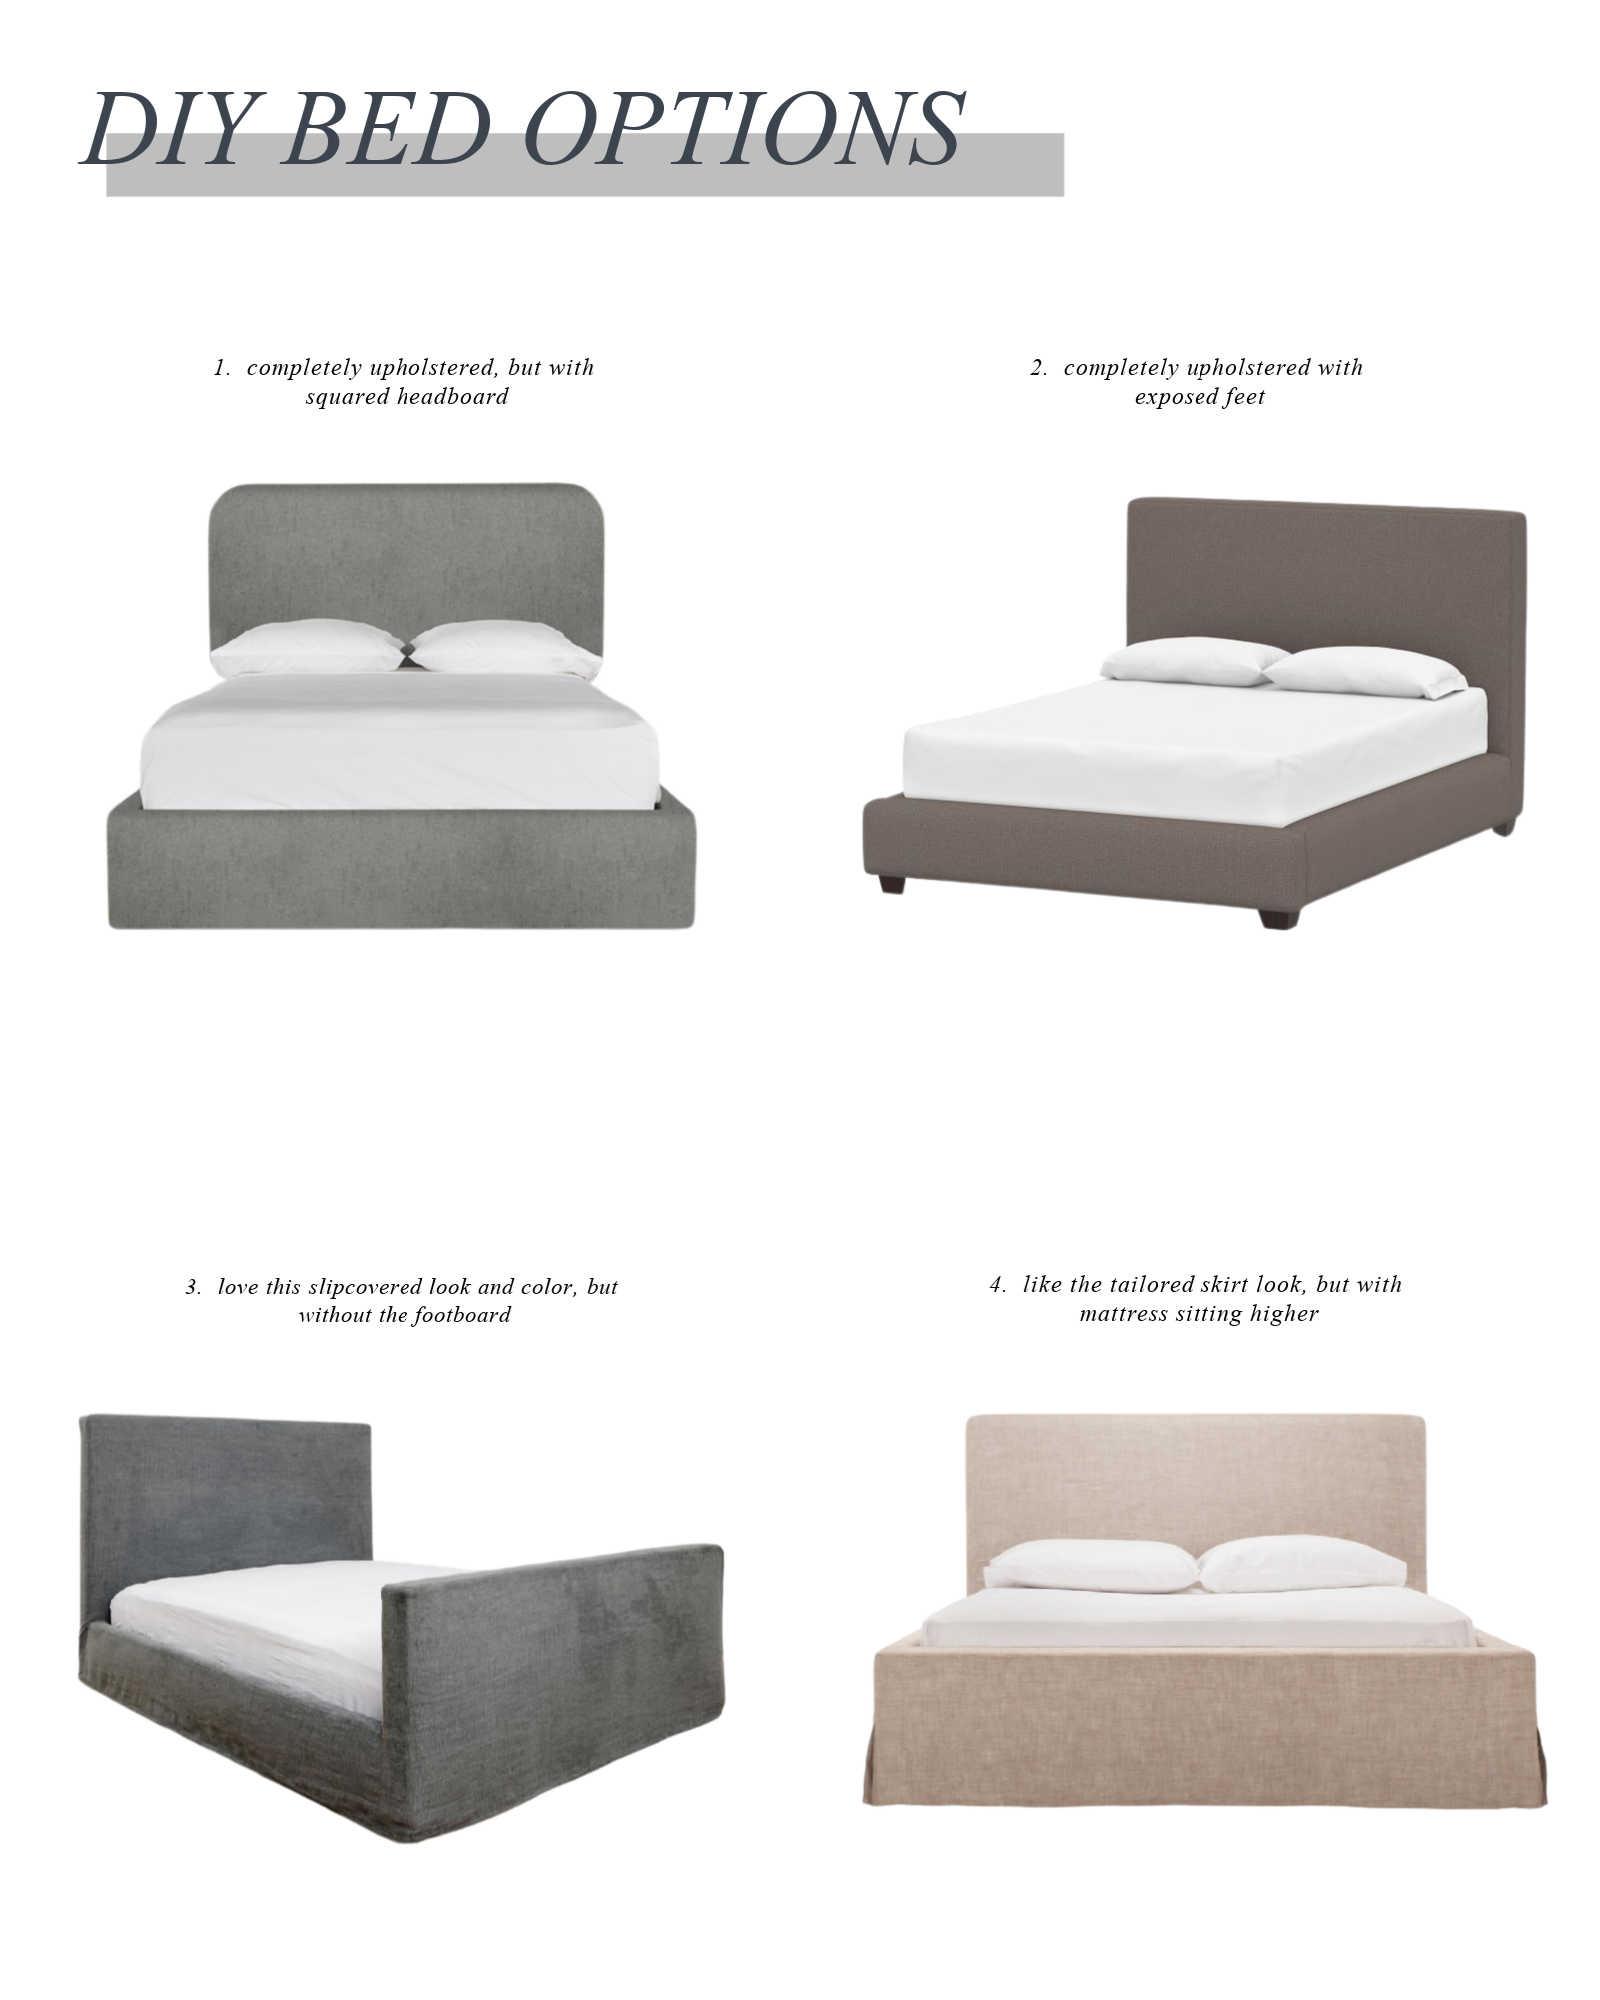 DIY bed options